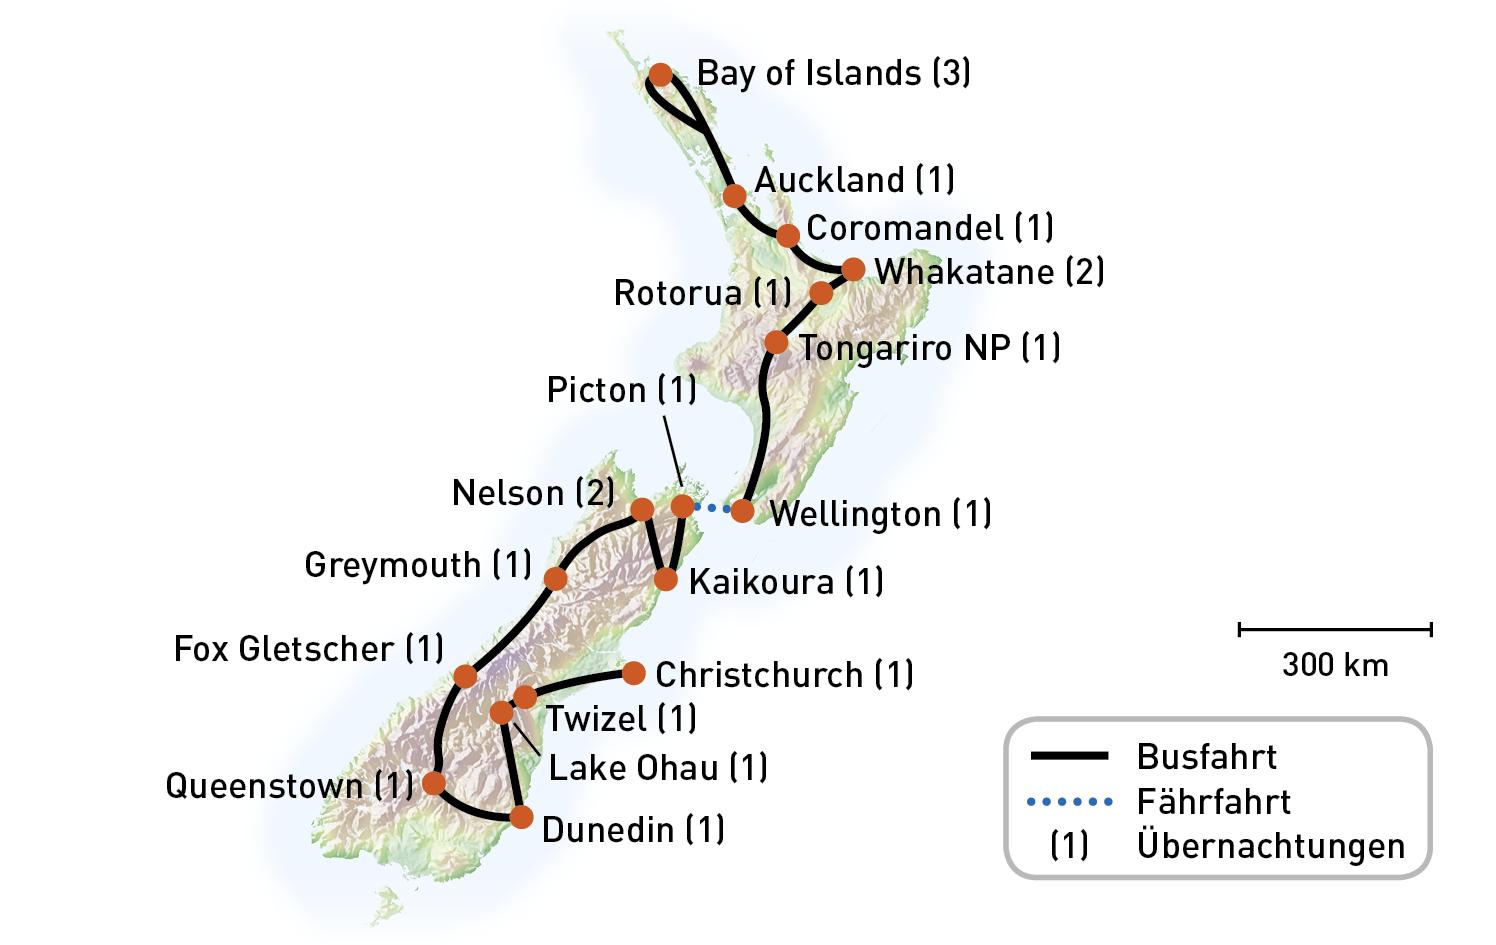 Routenkarte_Neuseeland_Naturweltenerleben_KiKa2020_RGB